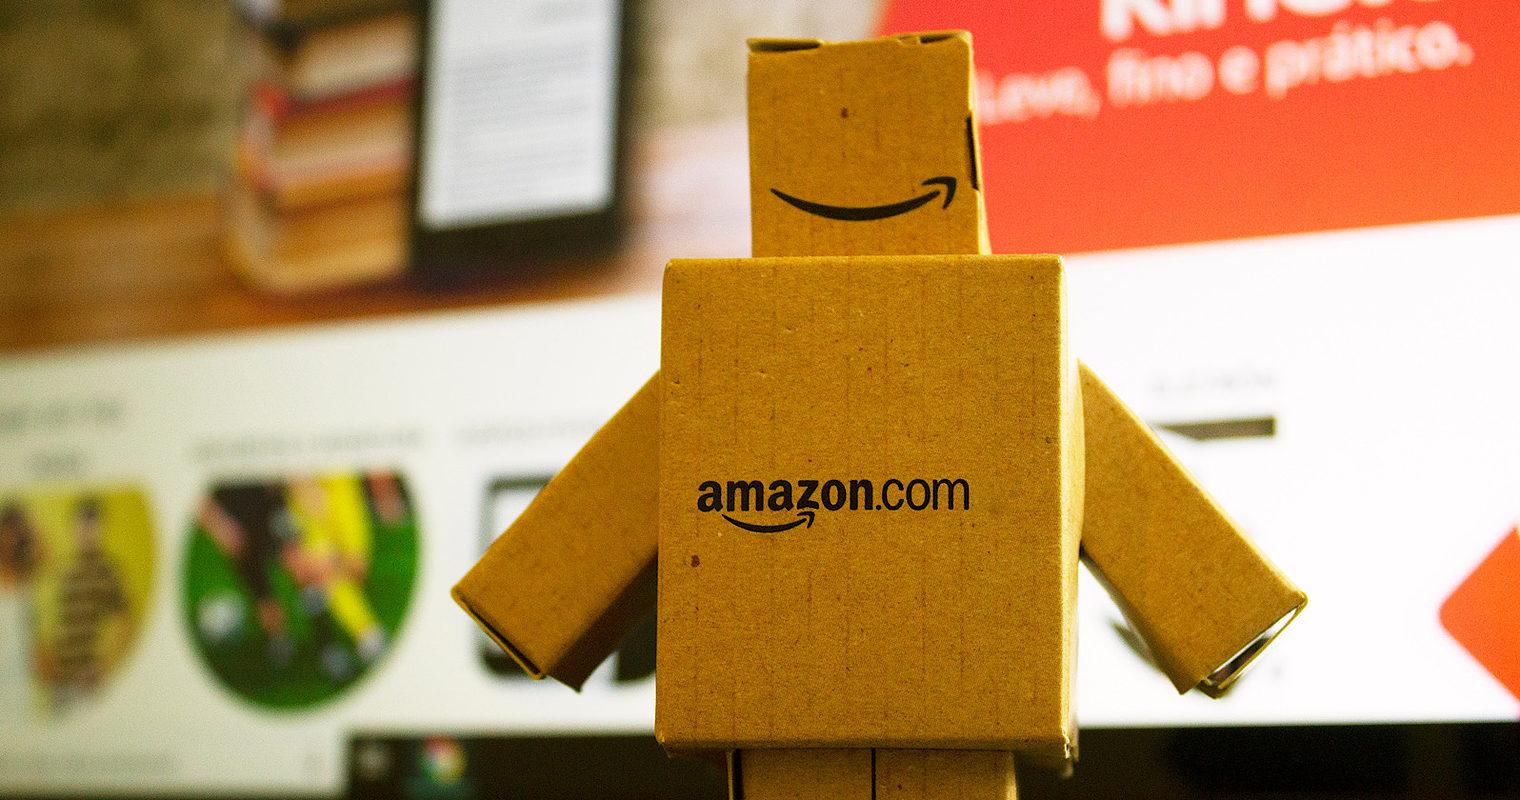 Study Predicts Google's Search Ad Revenue Will Drop While Amazon's Grows